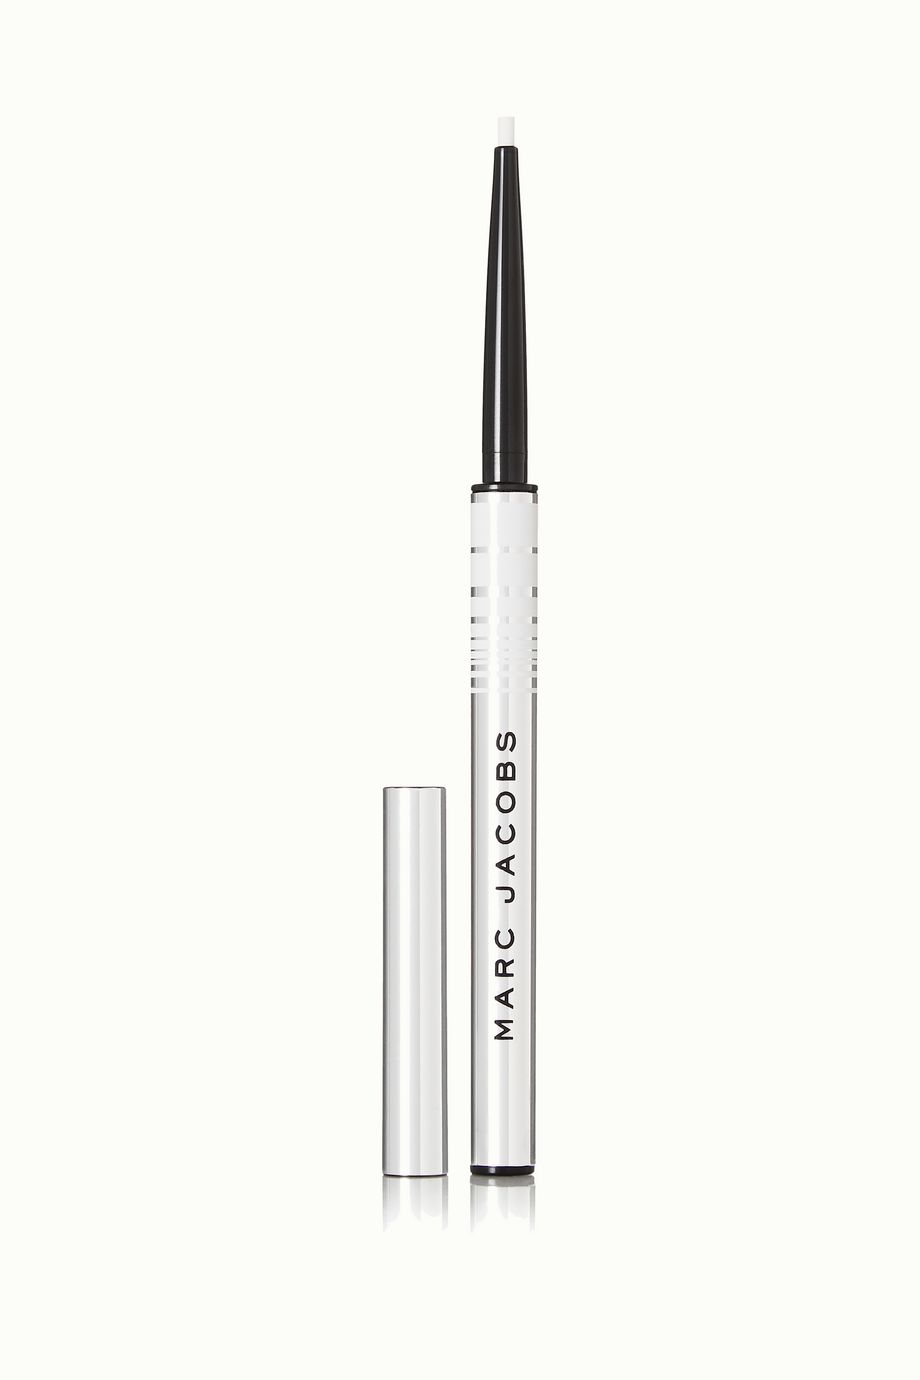 Marc Jacobs Beauty Fineliner Ultra-Skinny Gel Eye Crayon - Big (Eyes)!